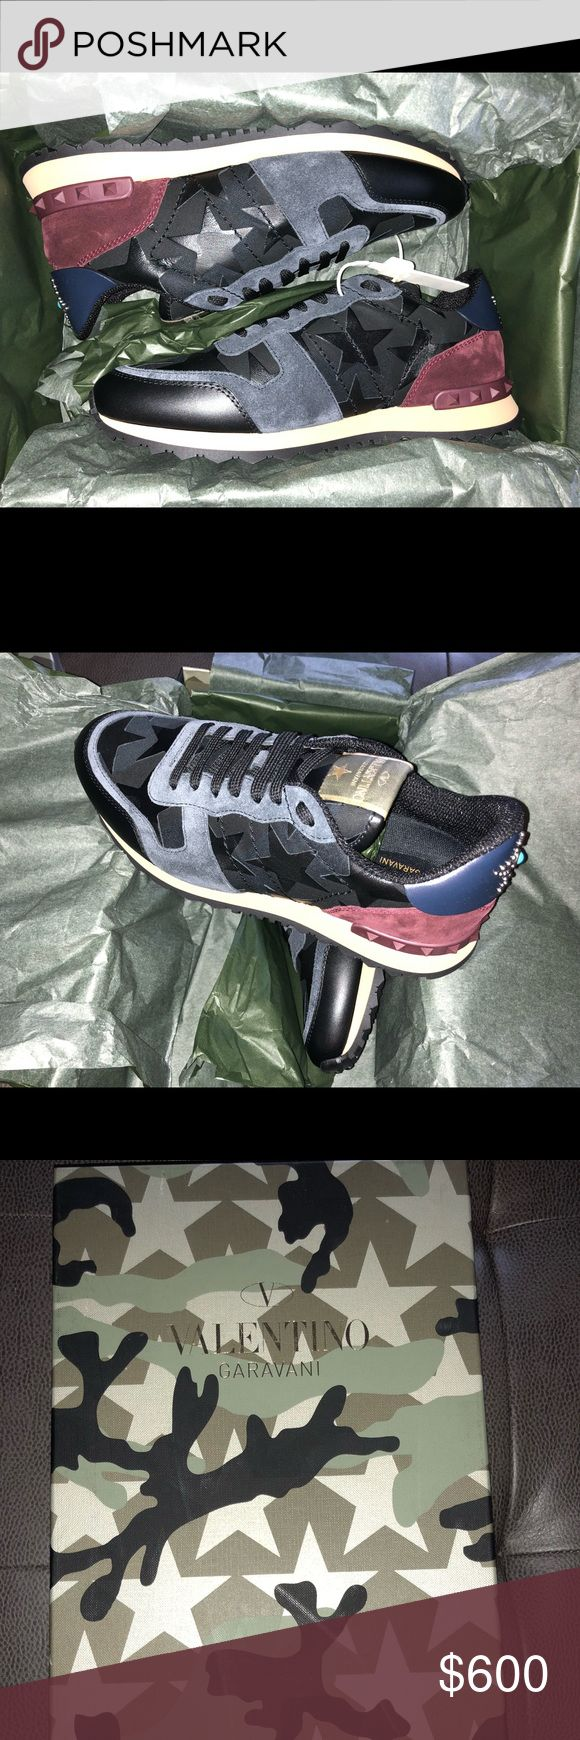 Valentino Mens Sneakers size 40.5 Brand New NY2S07 Men's Camustars Rockrunner Valentino Garavani NY2S0723ANC Size 40.5 Brand New Valentino Shoes Sneakers #valentinoshoes